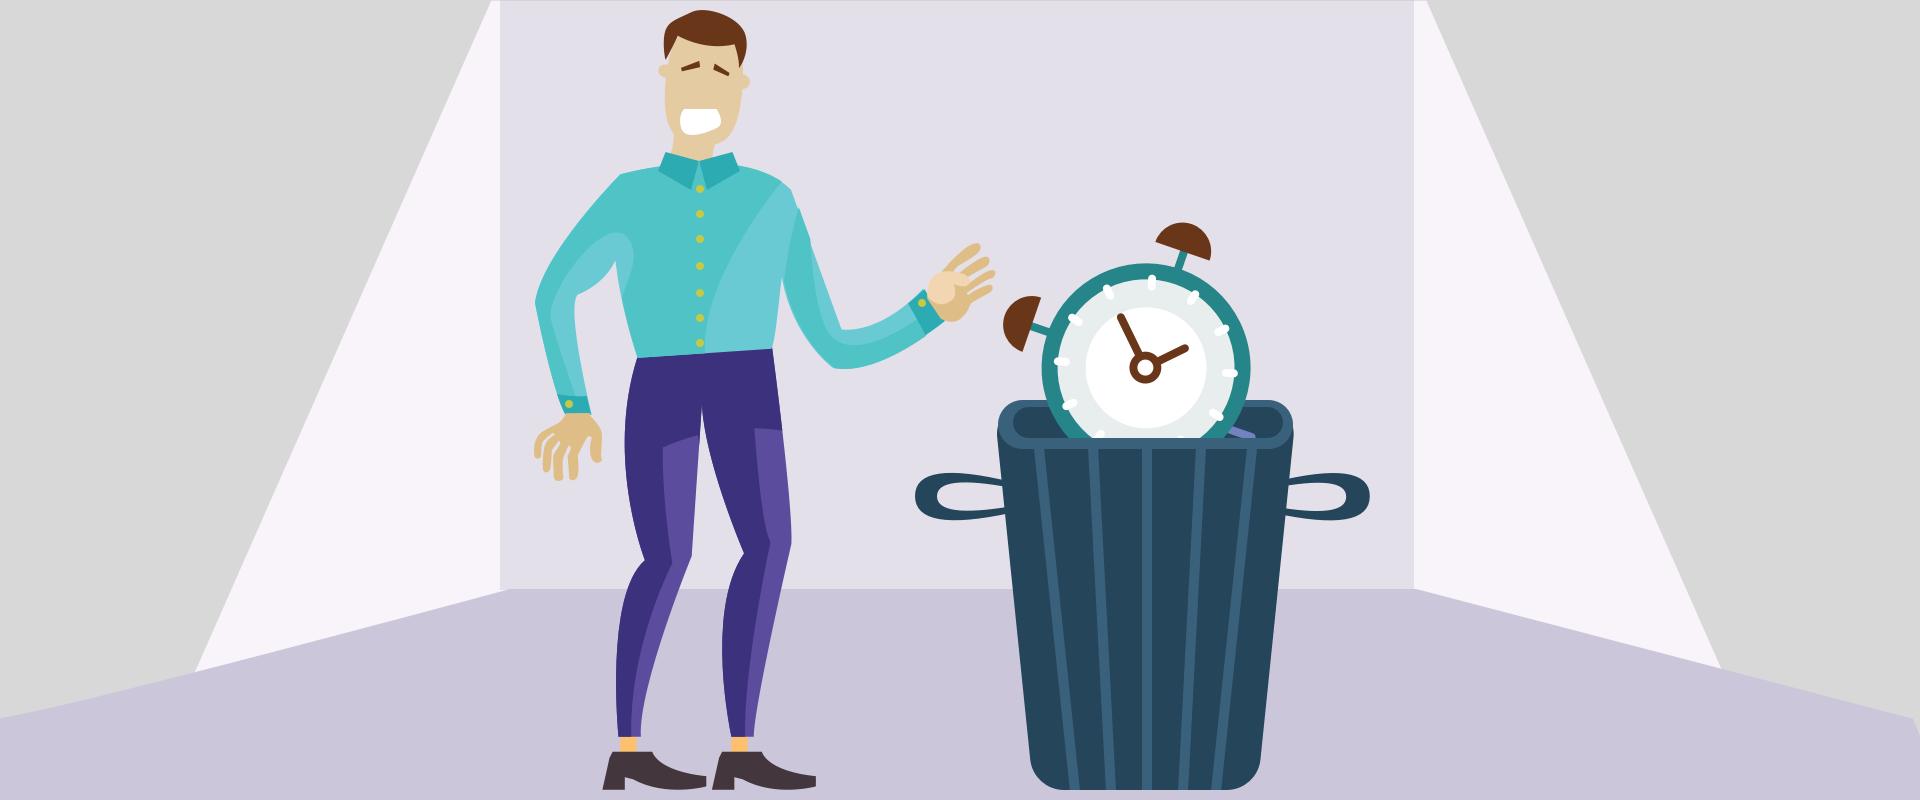 Illustration of man throwing clock in the bin representing bikeshedding.